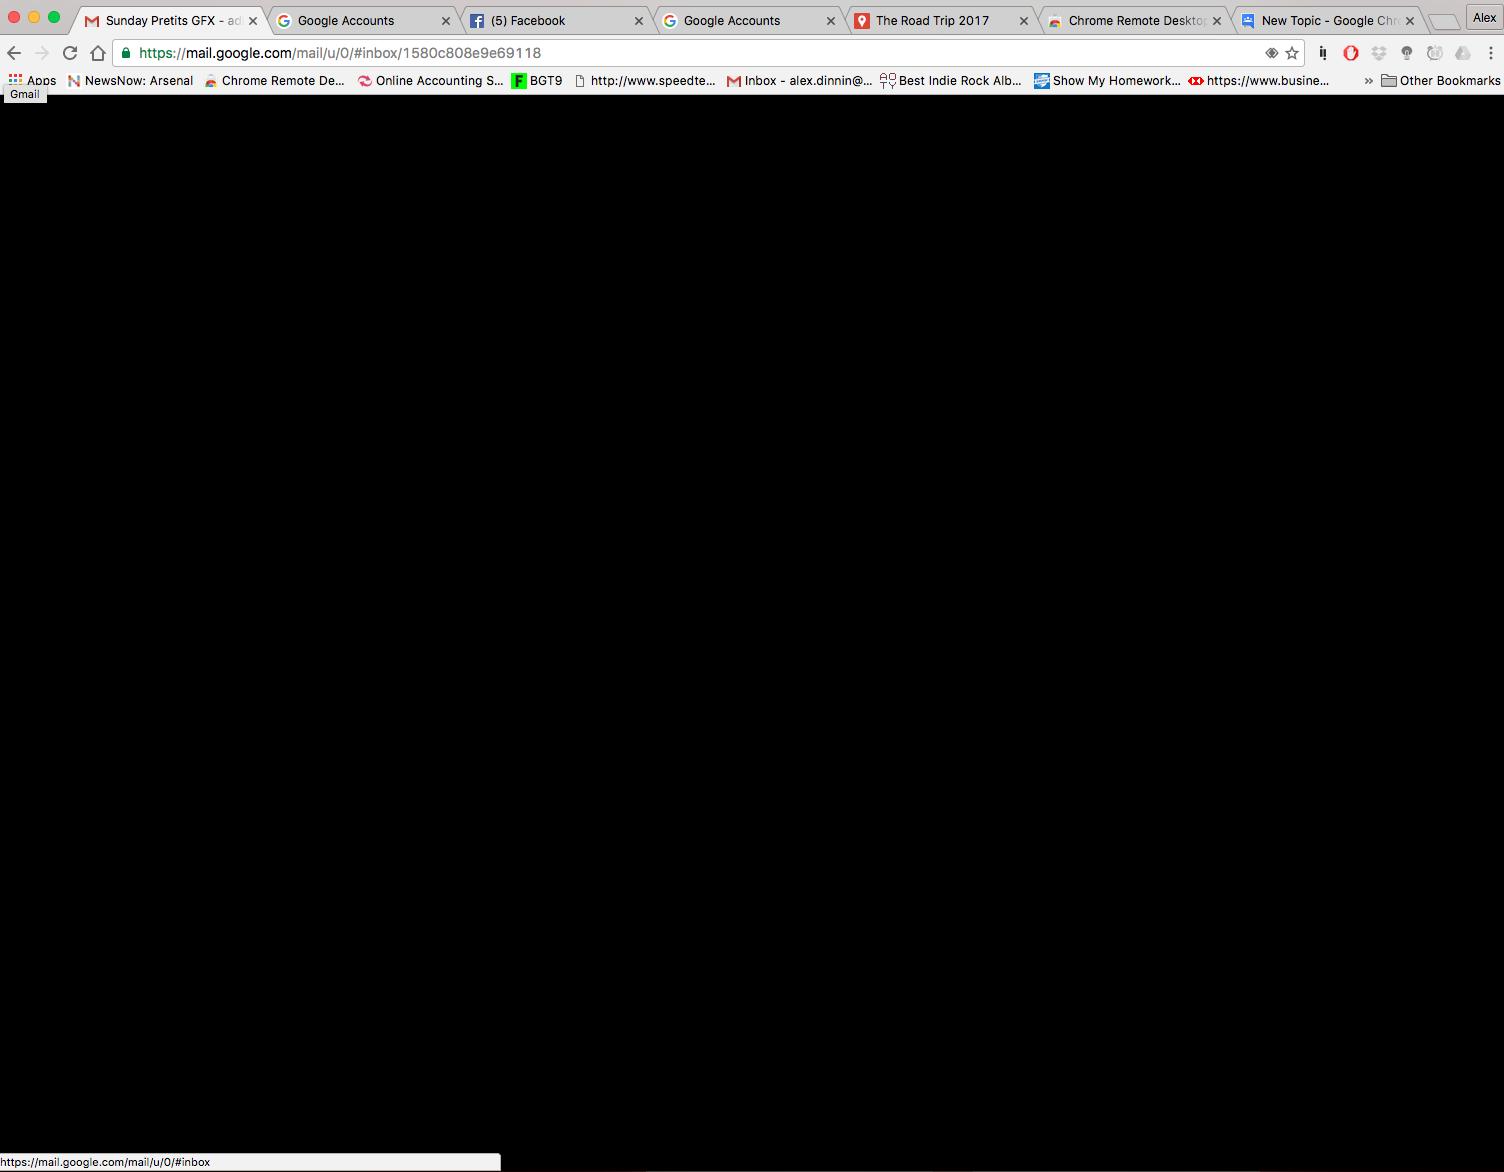 Google Chrome Canary Black Screen - carfasr